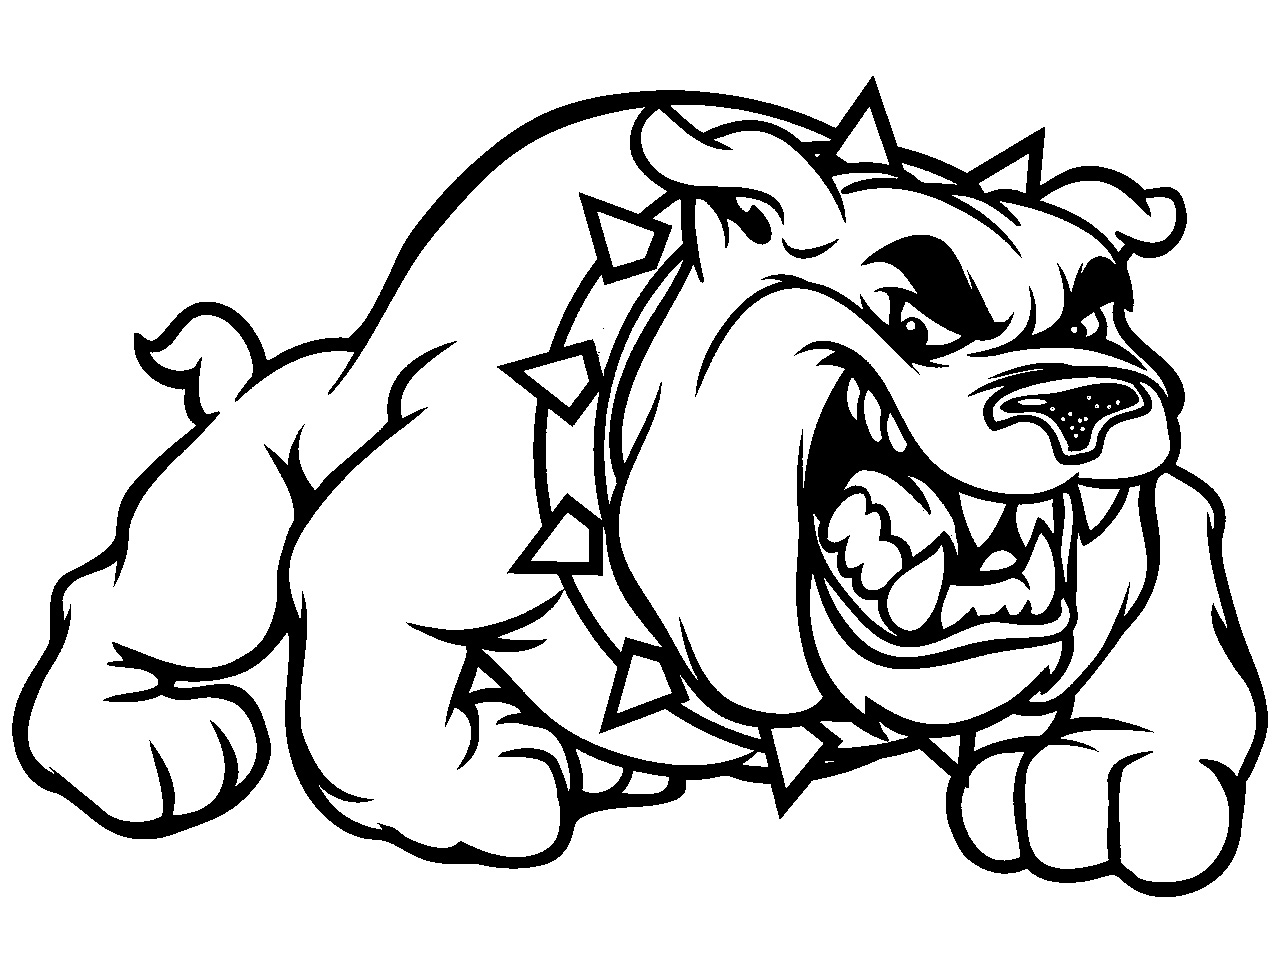 Bulldog clipart black and white. Image of